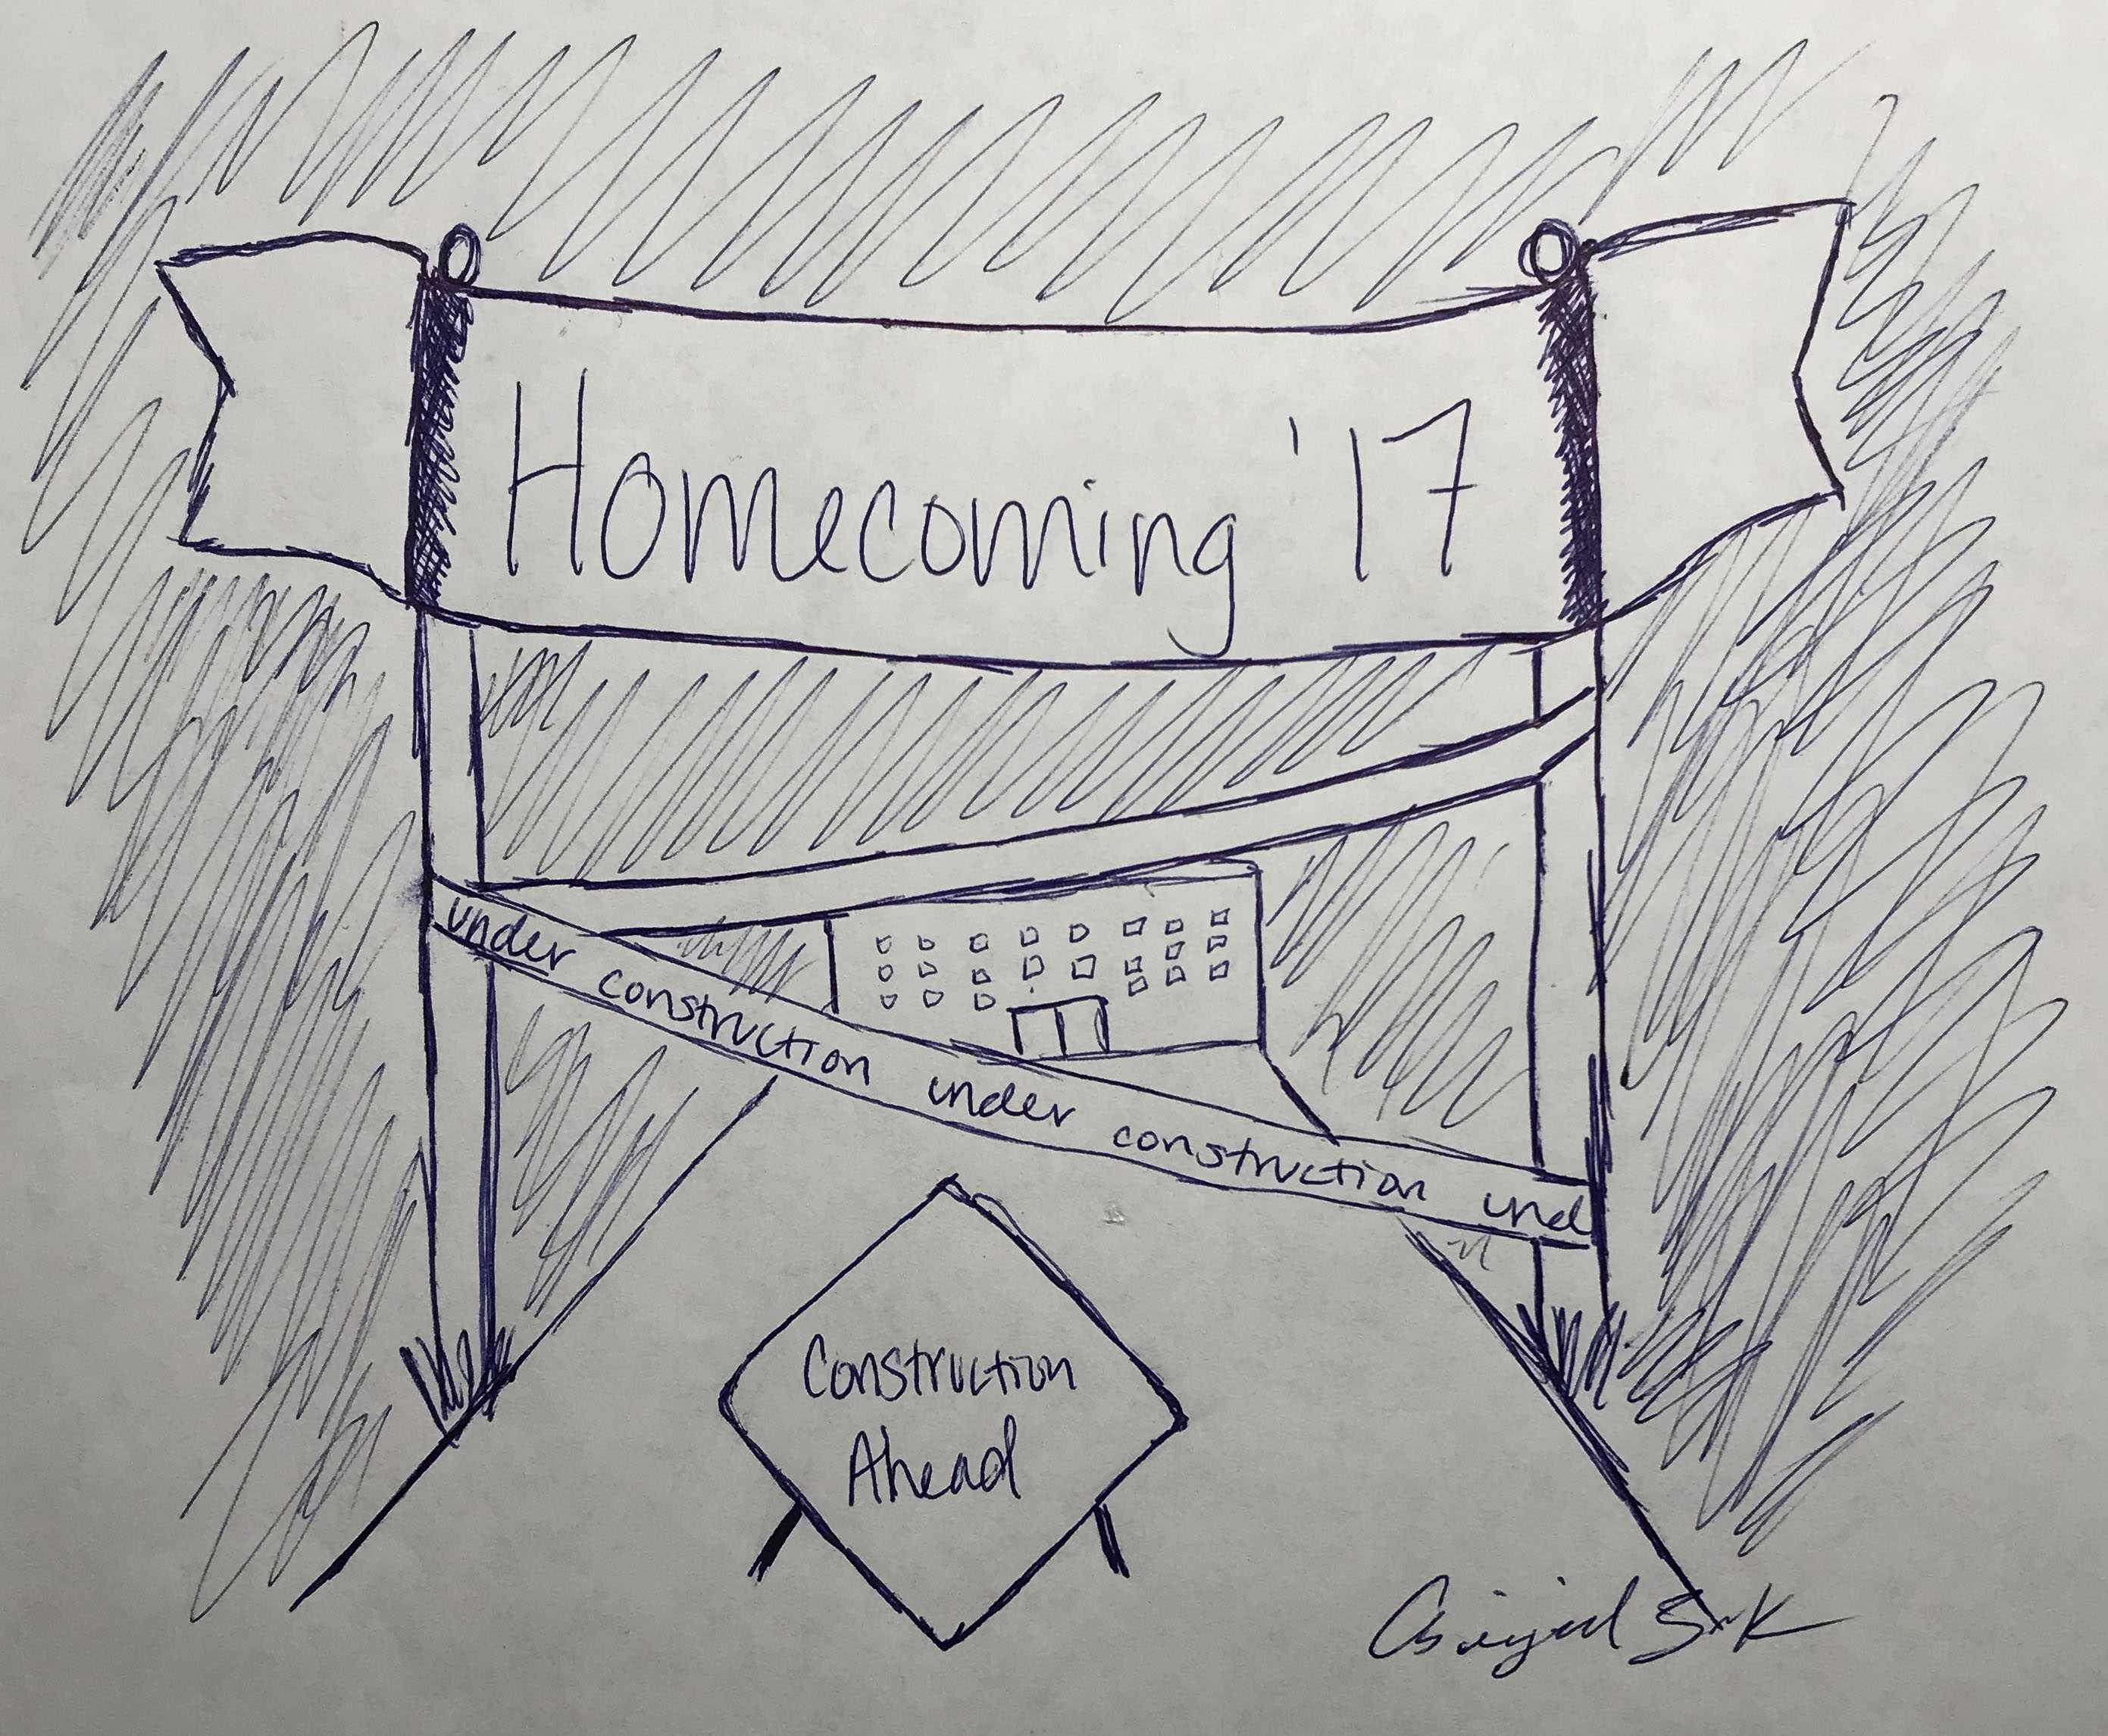 Homecoming needs to change